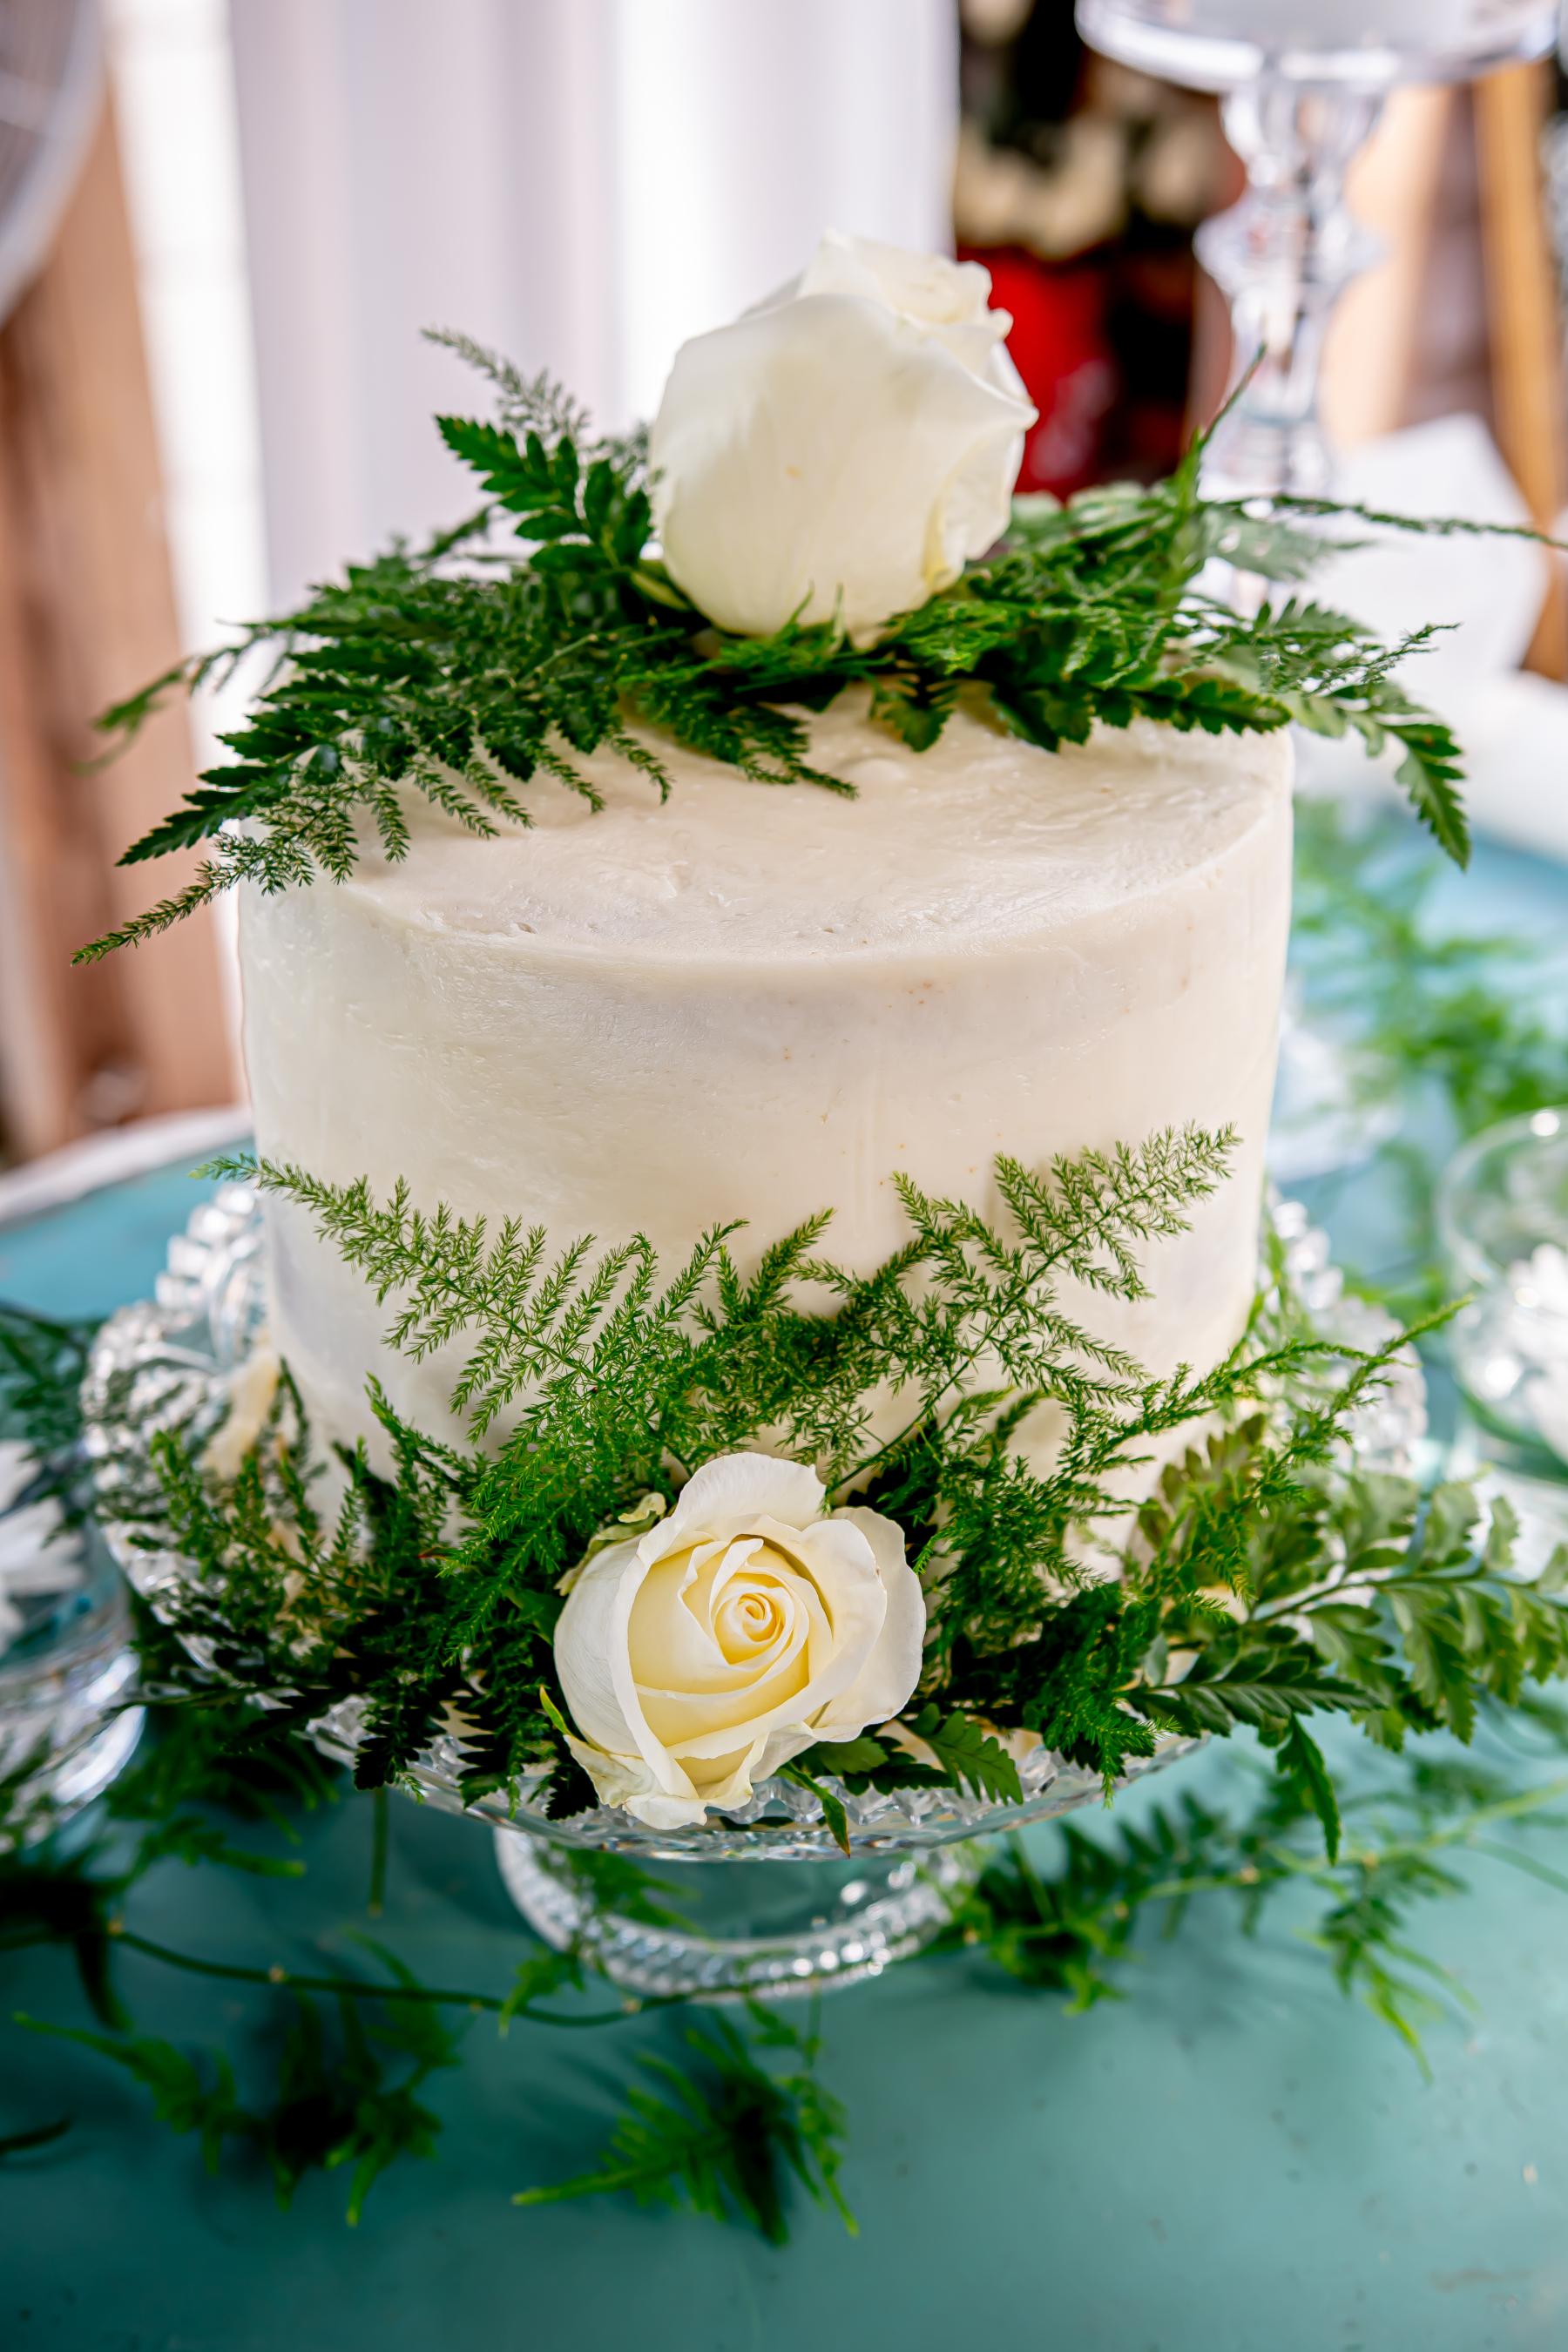 Small white wedding cake with greenery